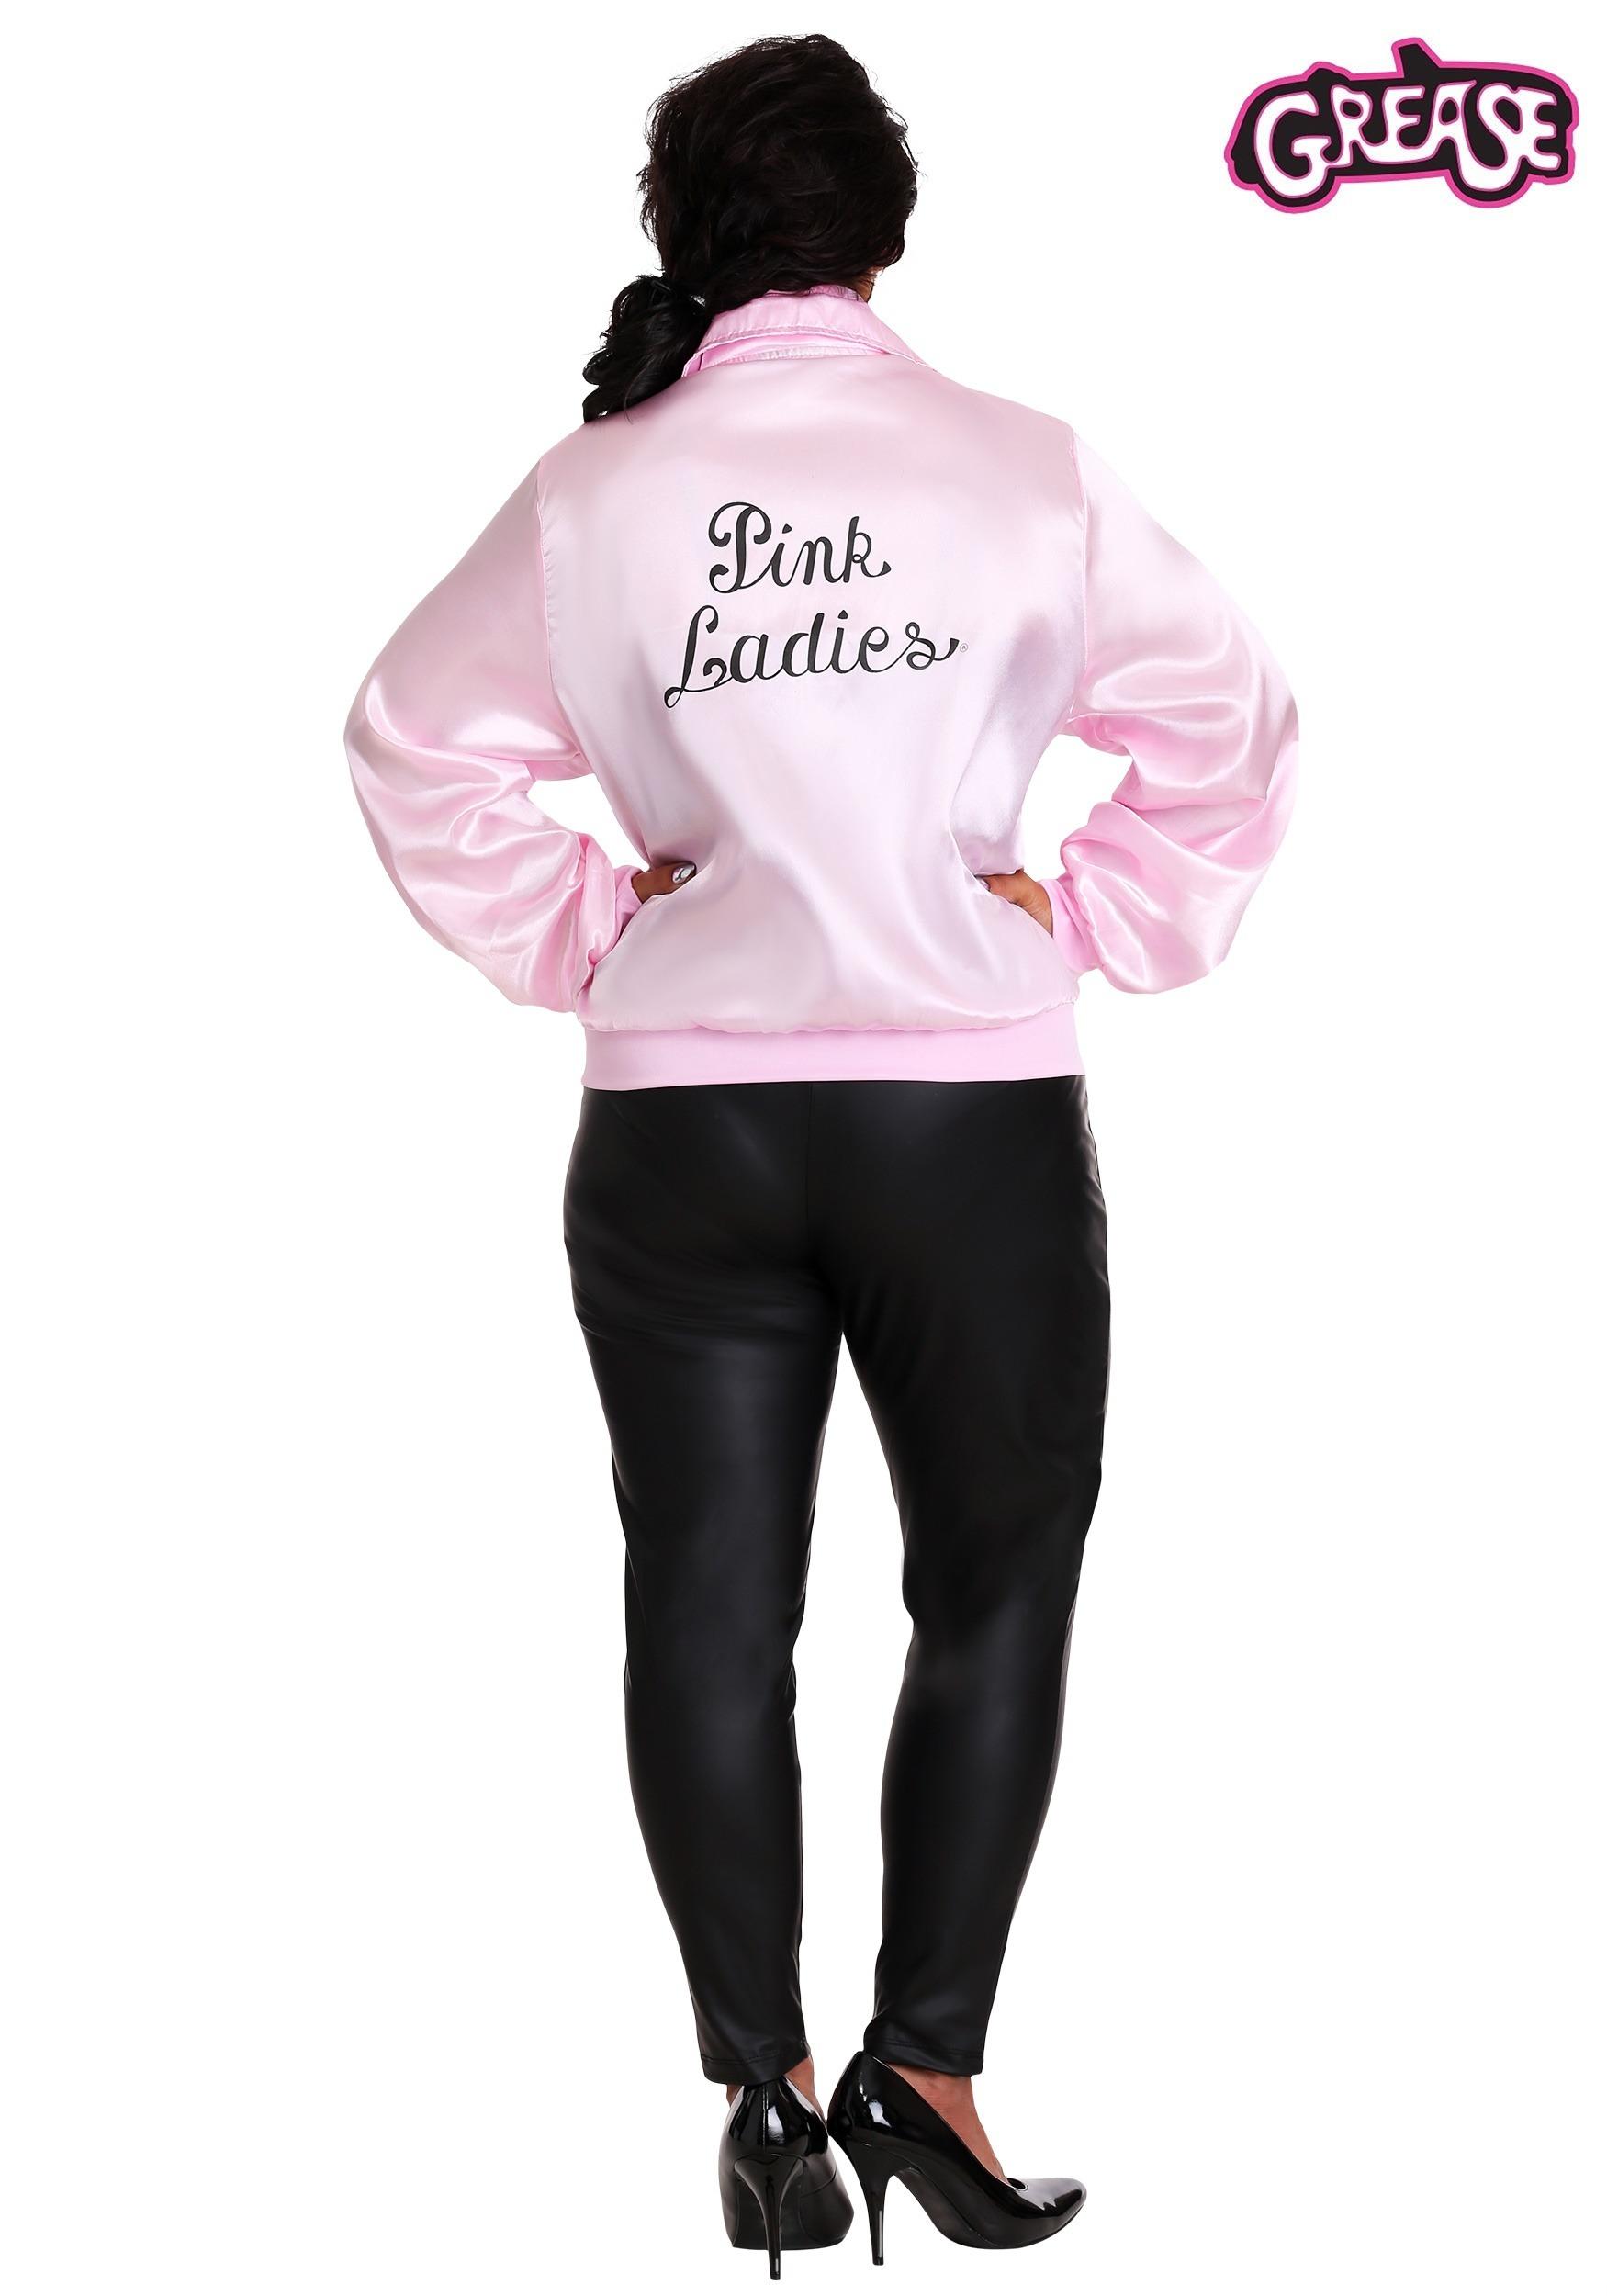 Plus Size Grease Pink Ladies Costume Jacket 1x 2x 3x 4x 5x 6x 7x